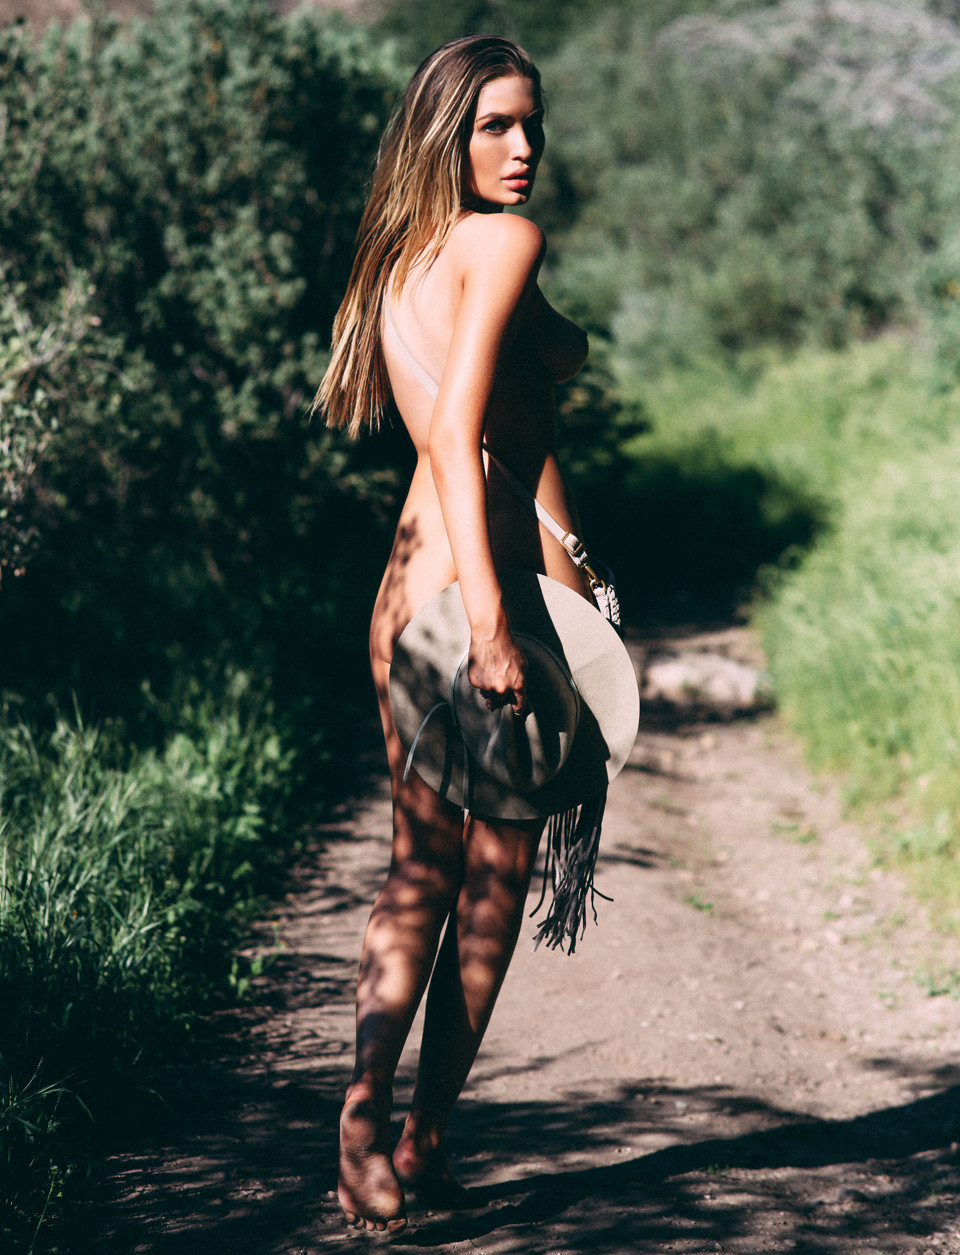 Alyse-Laurent-Naked-1